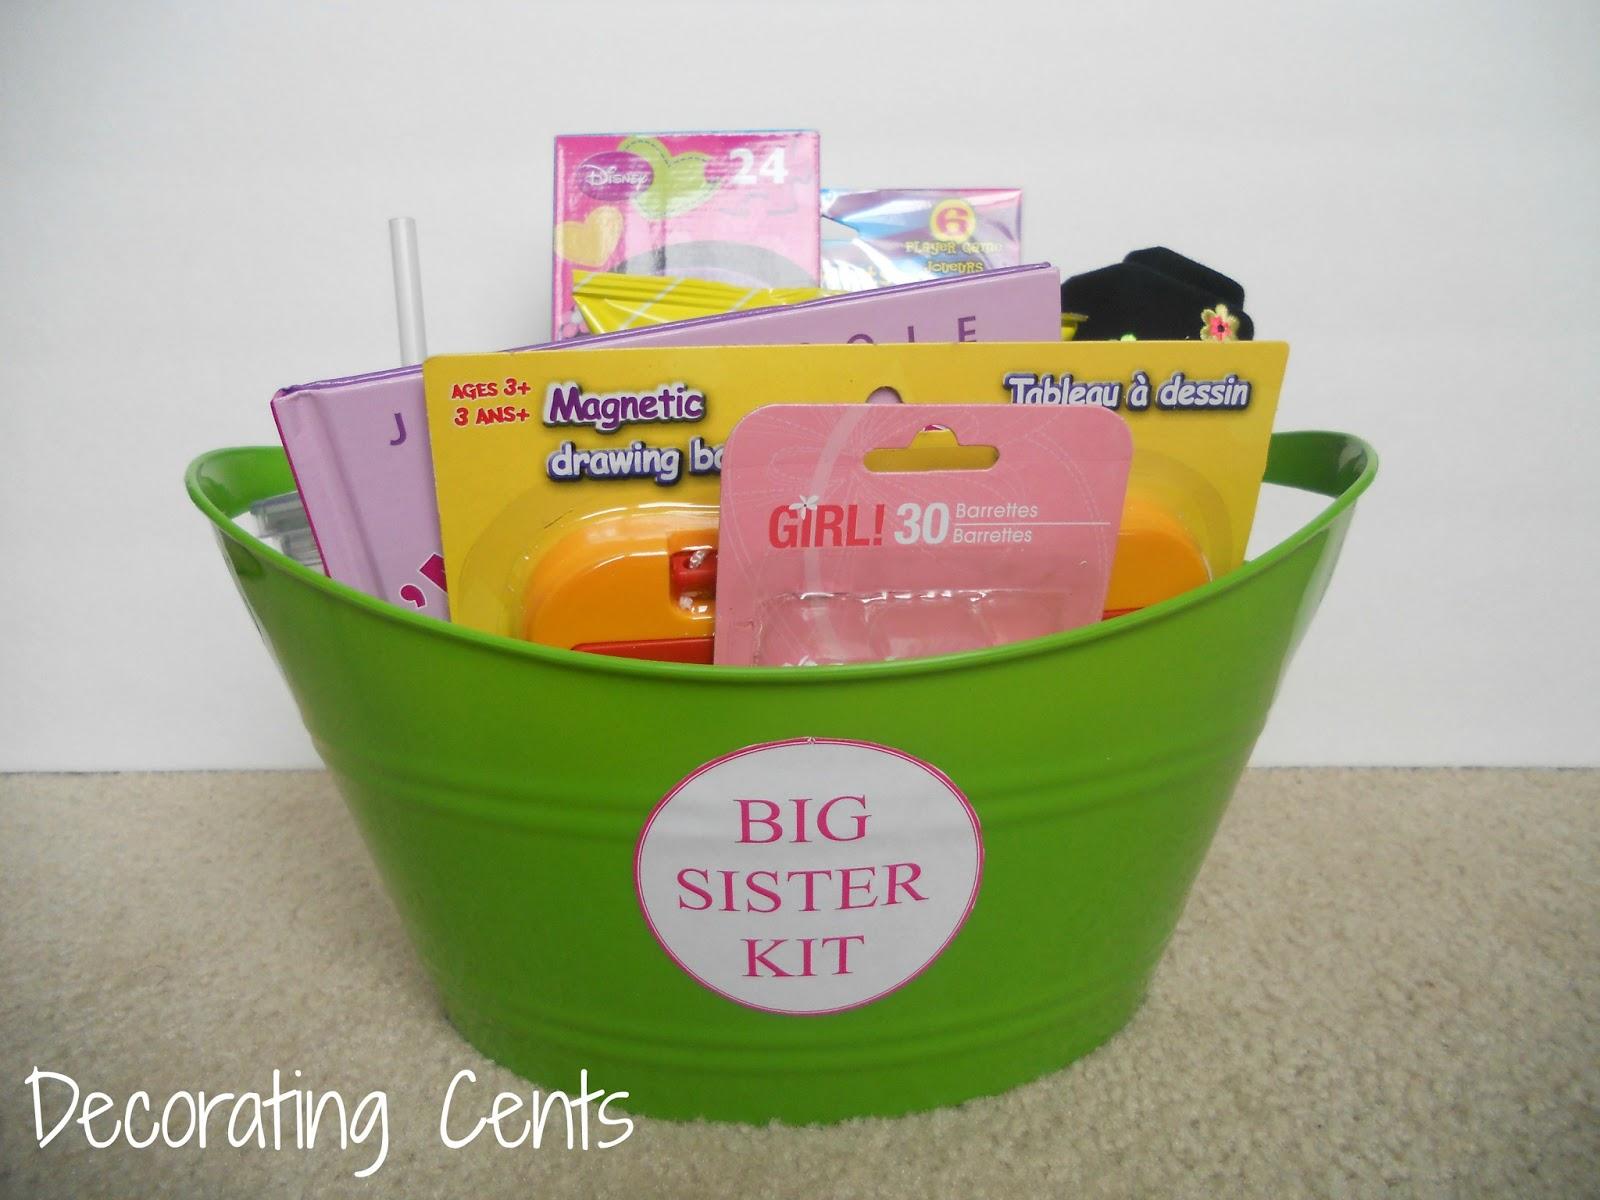 Decorating Cents: Big Sister Kit